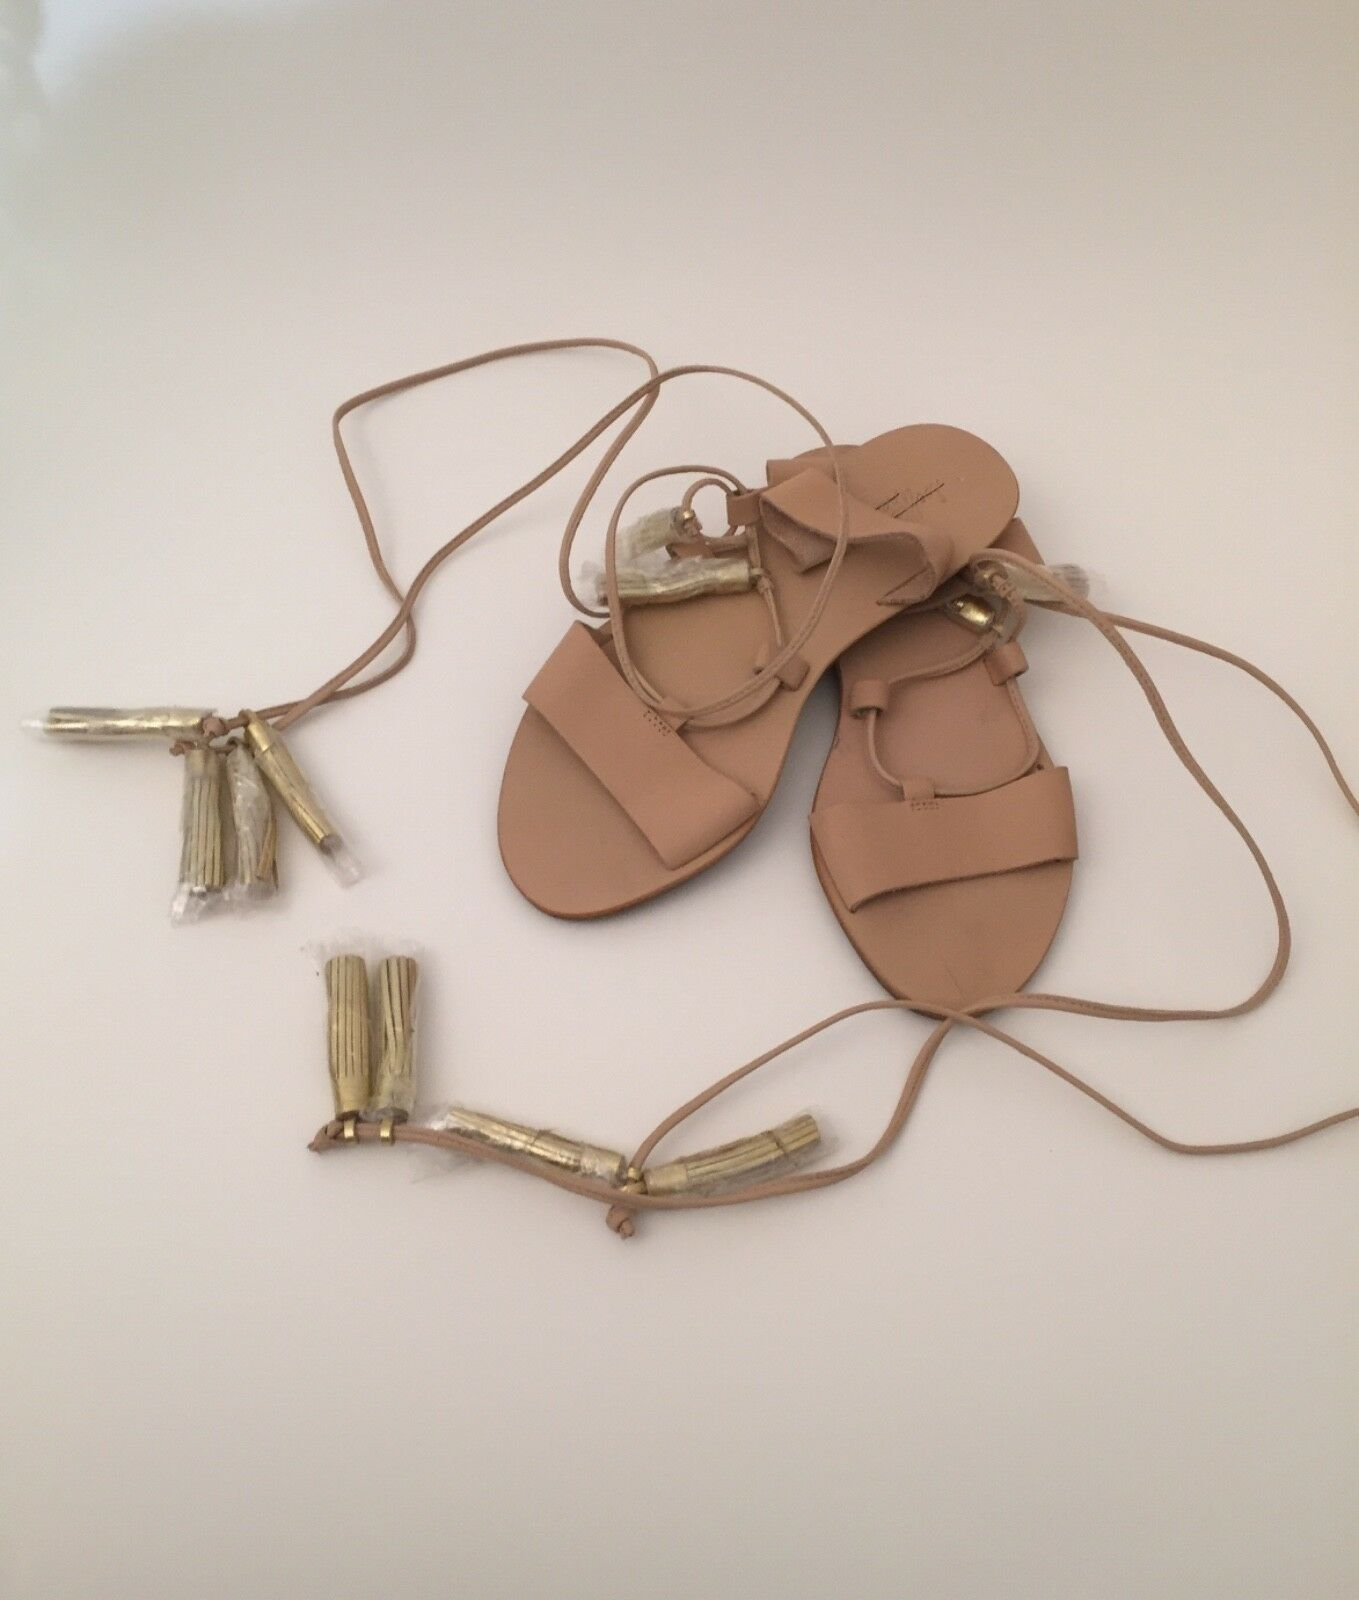 Loeffler Randall Saffron Tassel Lace Up Sandales Sandales Sandales Gold - Sz 6 38e942